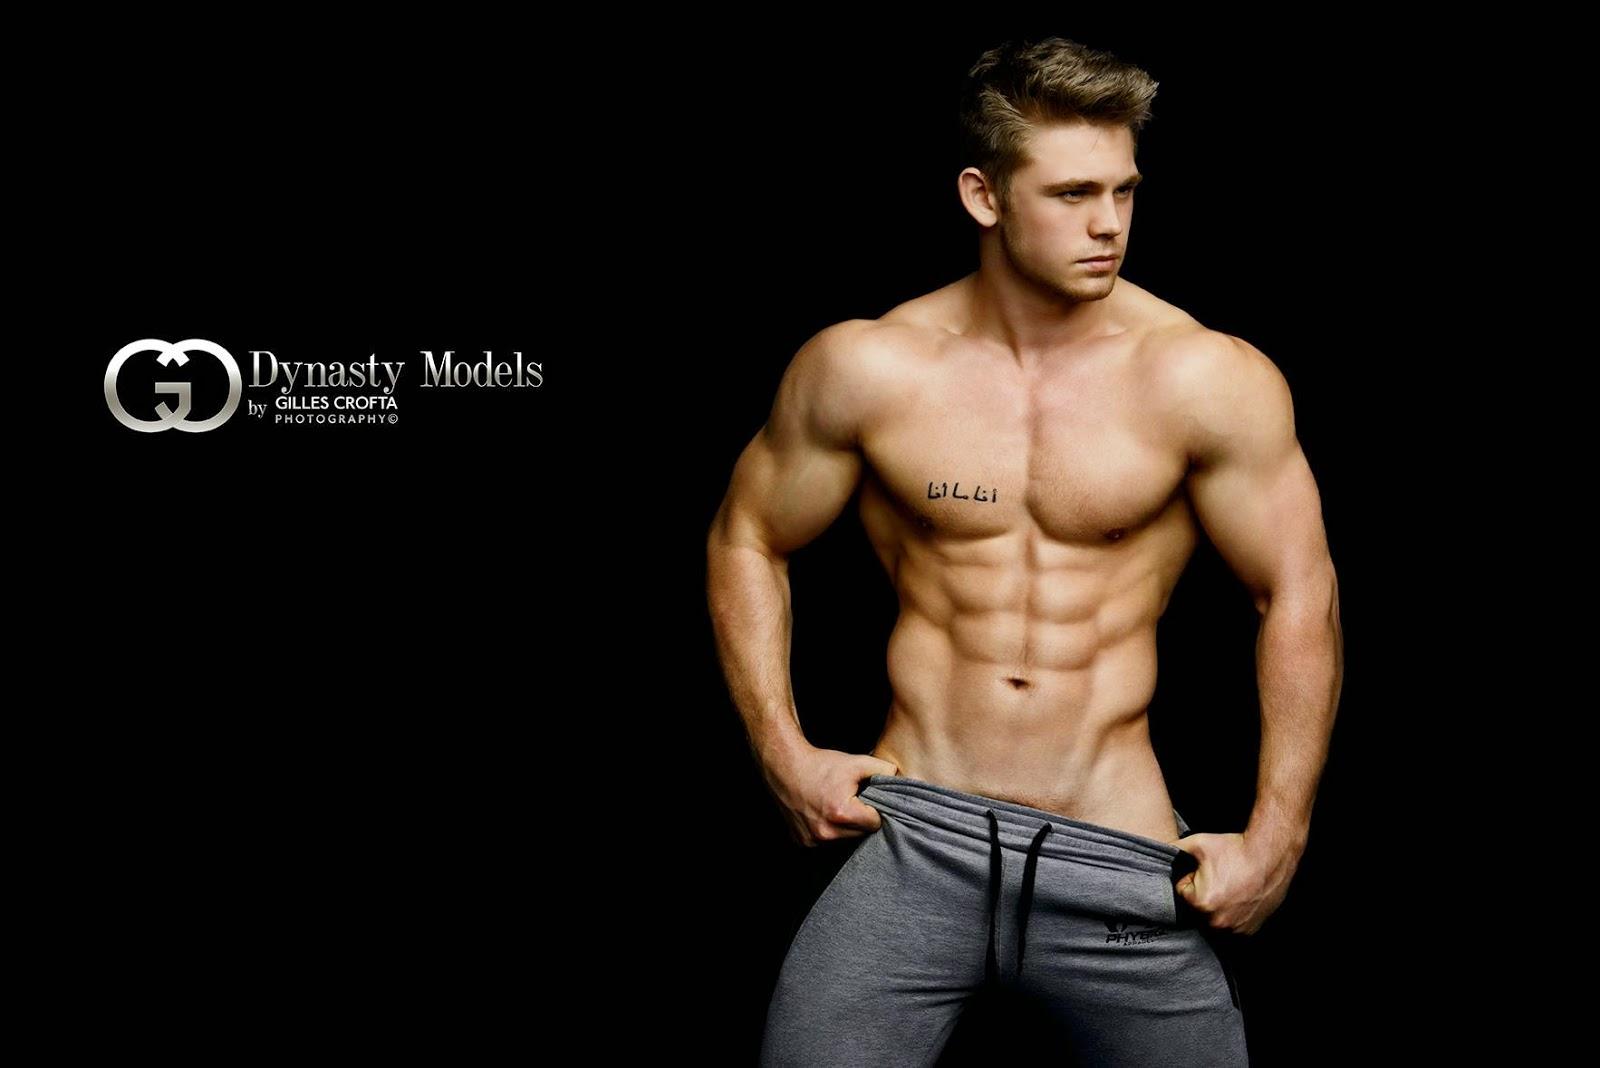 aesthetic muscle, bodybuilder, great abs, Jack Storer, male fitness model, male model, muscle, physique, ripped muscle, vascular muscle,  aesthetic muscle, bodybuilder, great abs, Jack Storer, male fitness model, male model, muscle, physique, ripped muscle, vascular muscle,